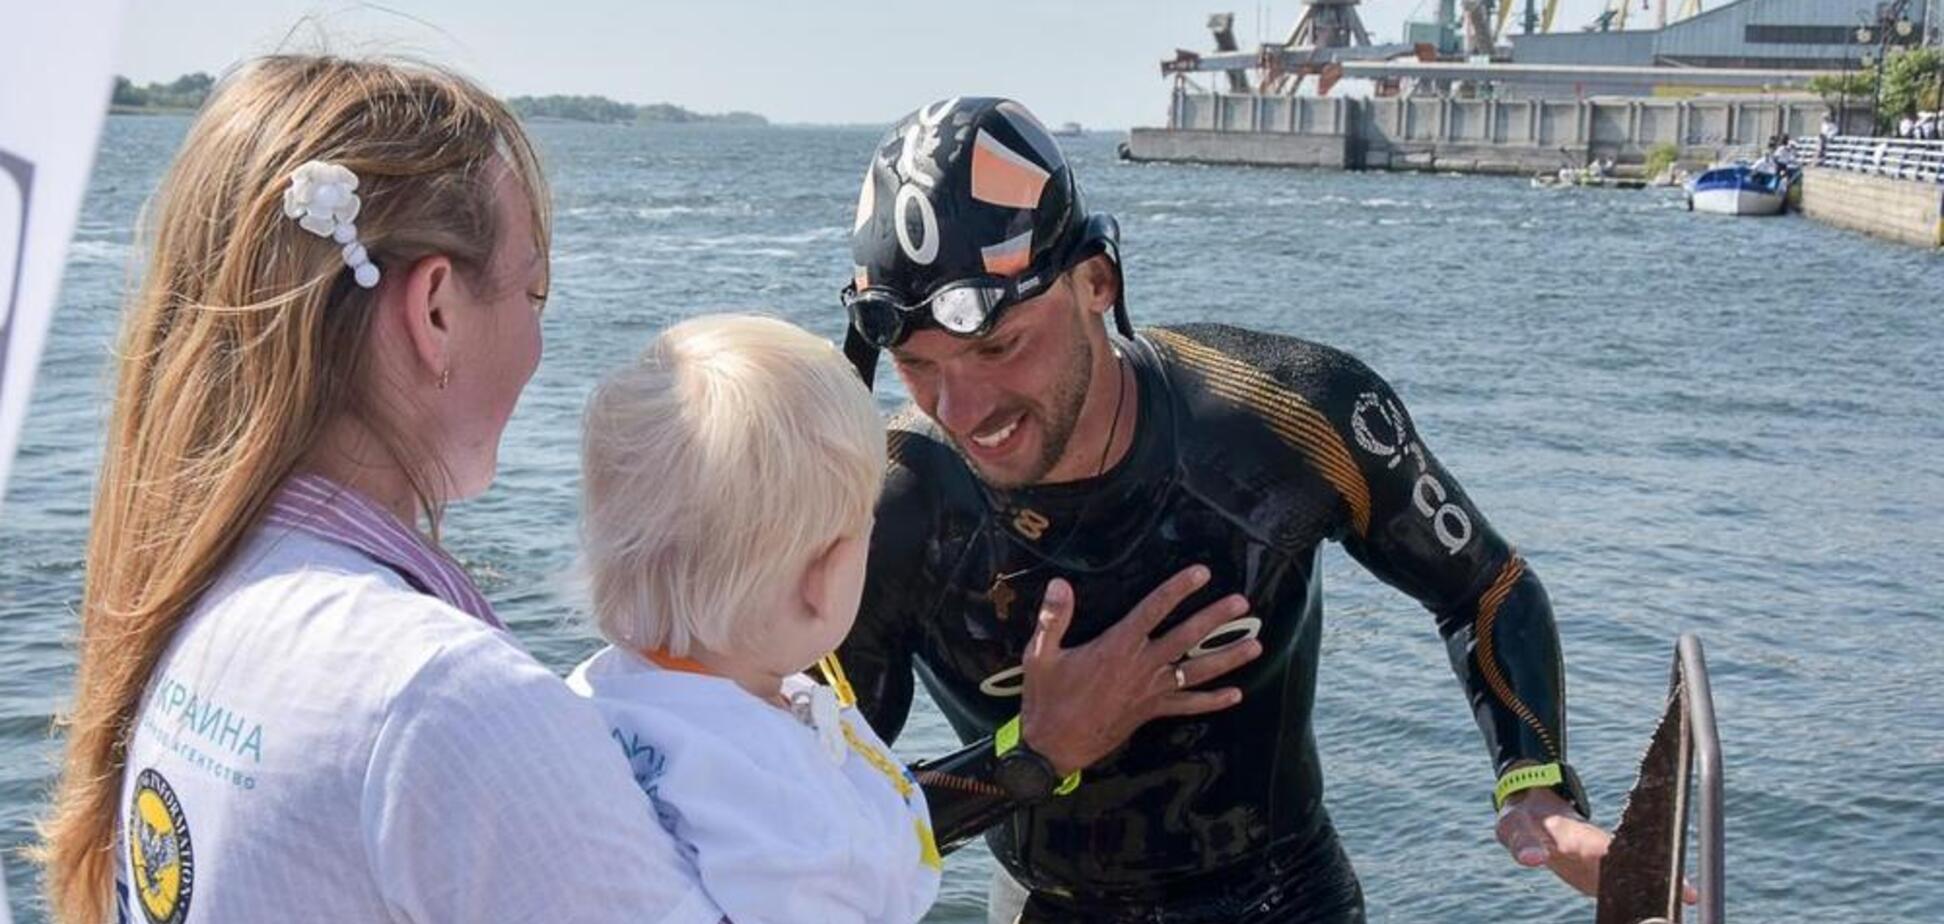 Почти фантастика: украинец проплыл 900 км по Днепру